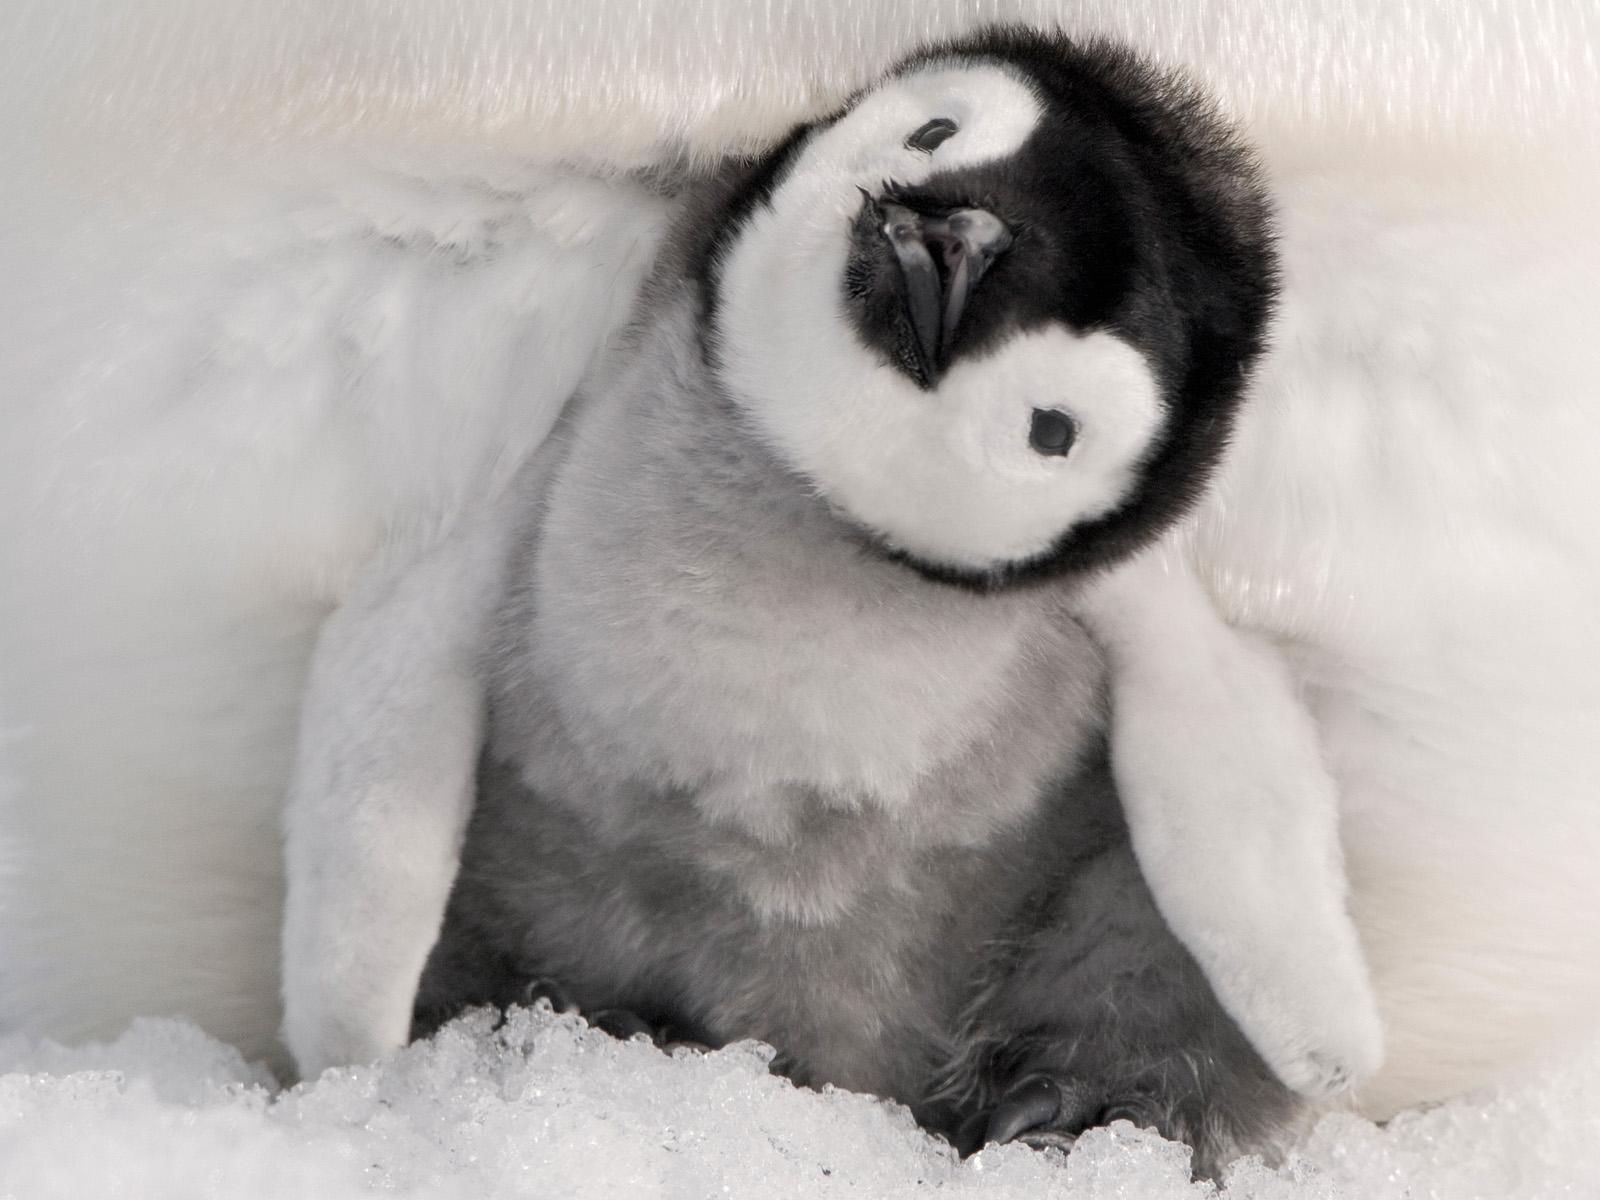 Cute Baby Penguins Wallpaper 1600x1200 45956